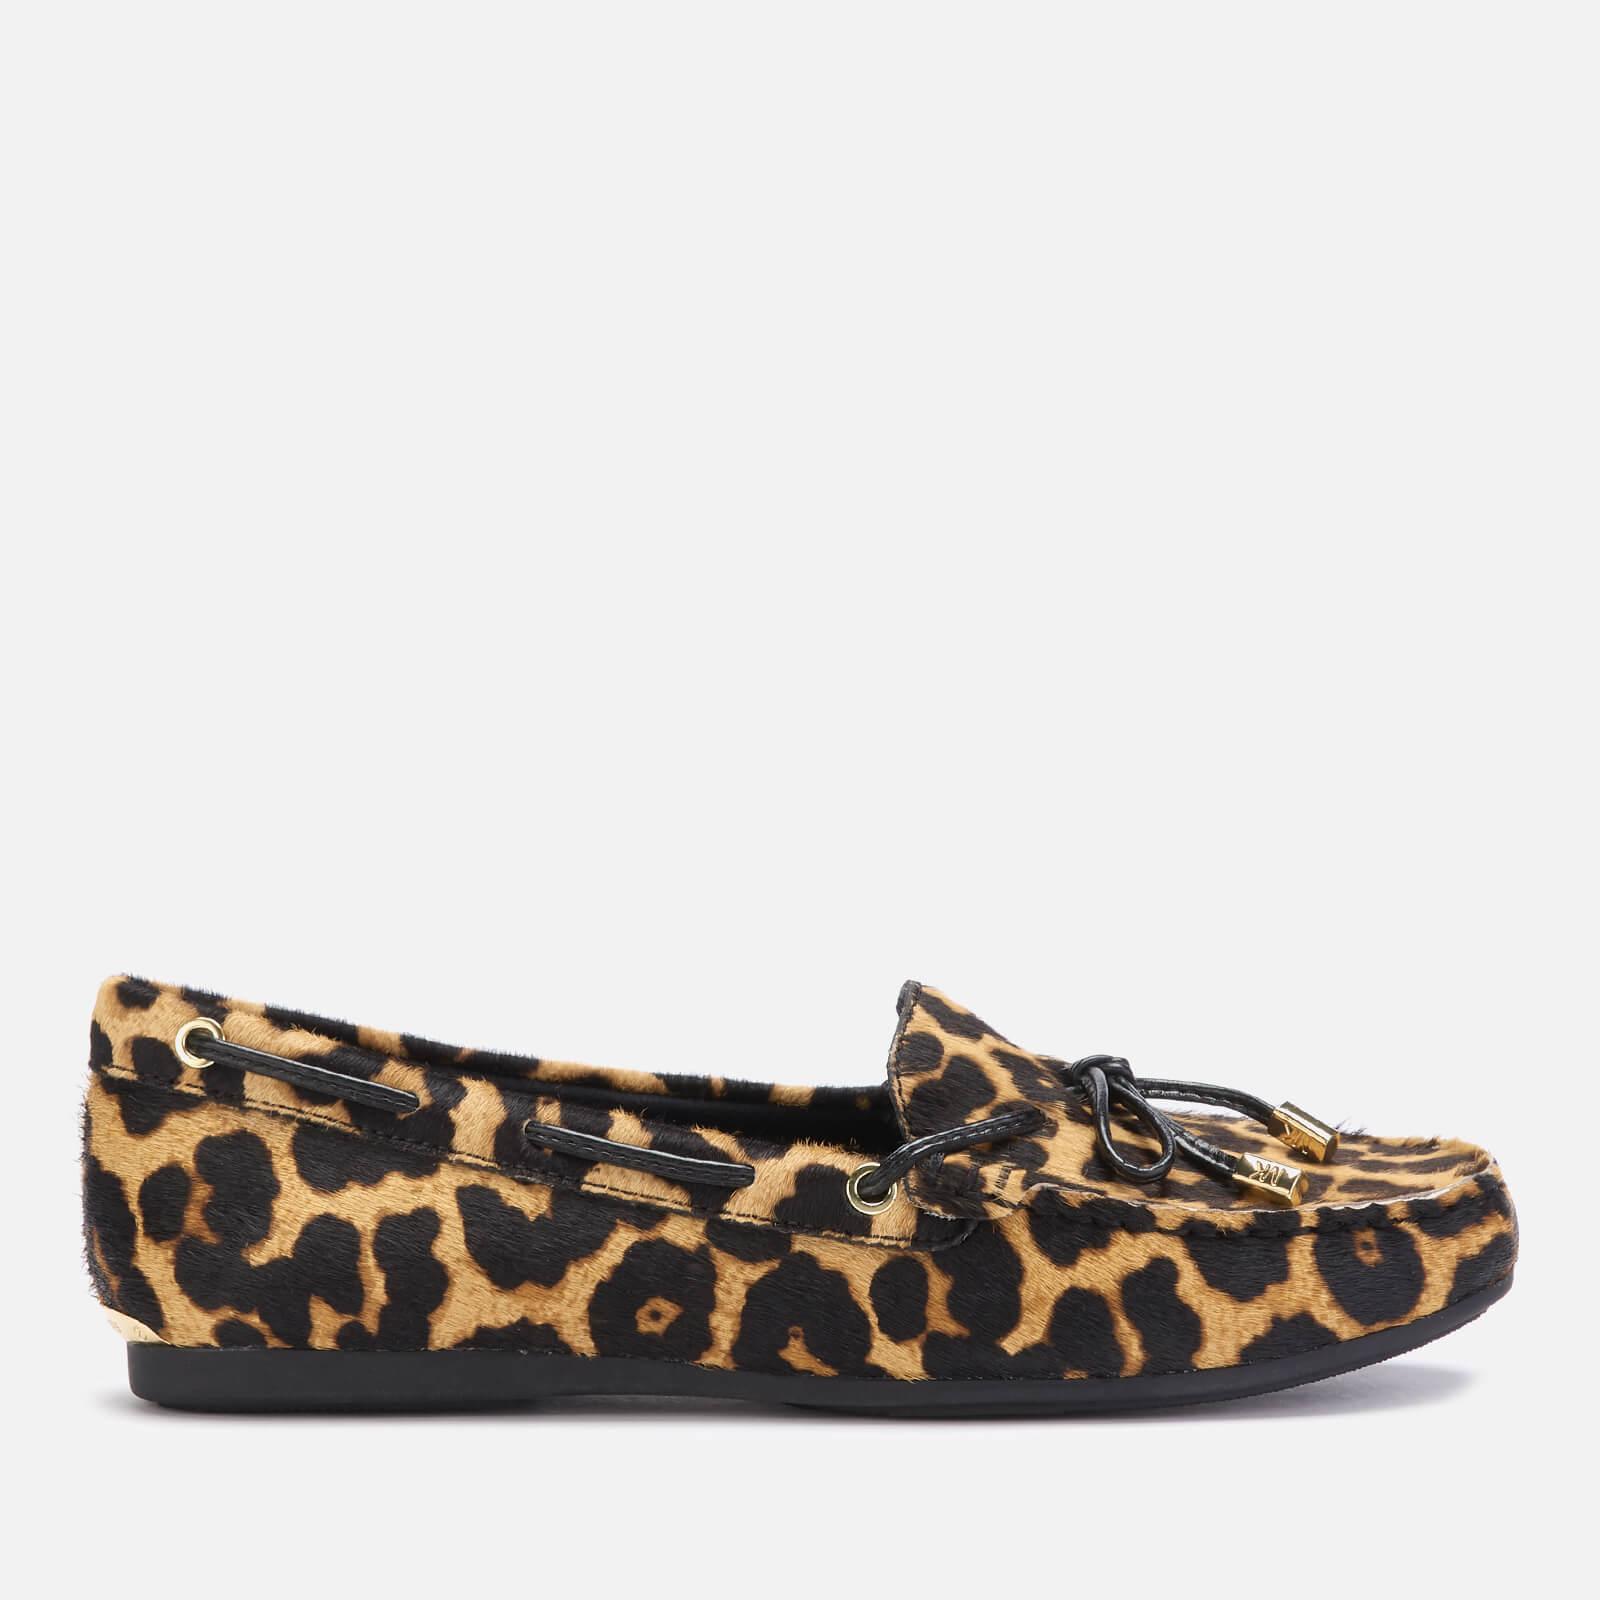 MICHAEL MICHAEL KORS Women's Sutton Leopard Moc Flats - Natural - UK 5/US 8 - Tan